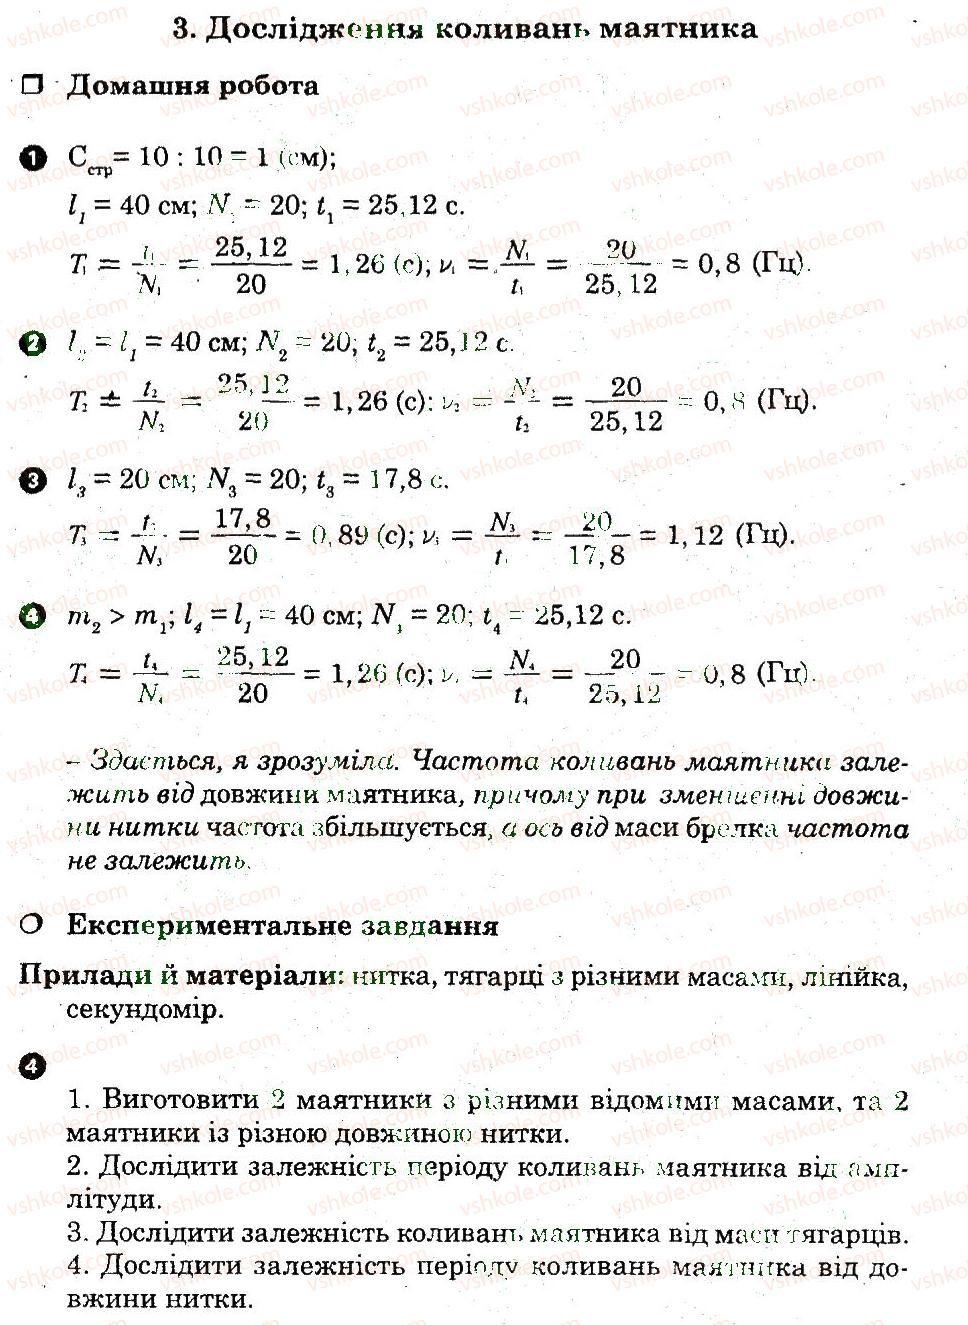 8-fizika-fya-bozhinova-oo-kiryuhina-2010-zoshit-dlya-laboratornih-robit--laboratorni-roboti-3.jpg